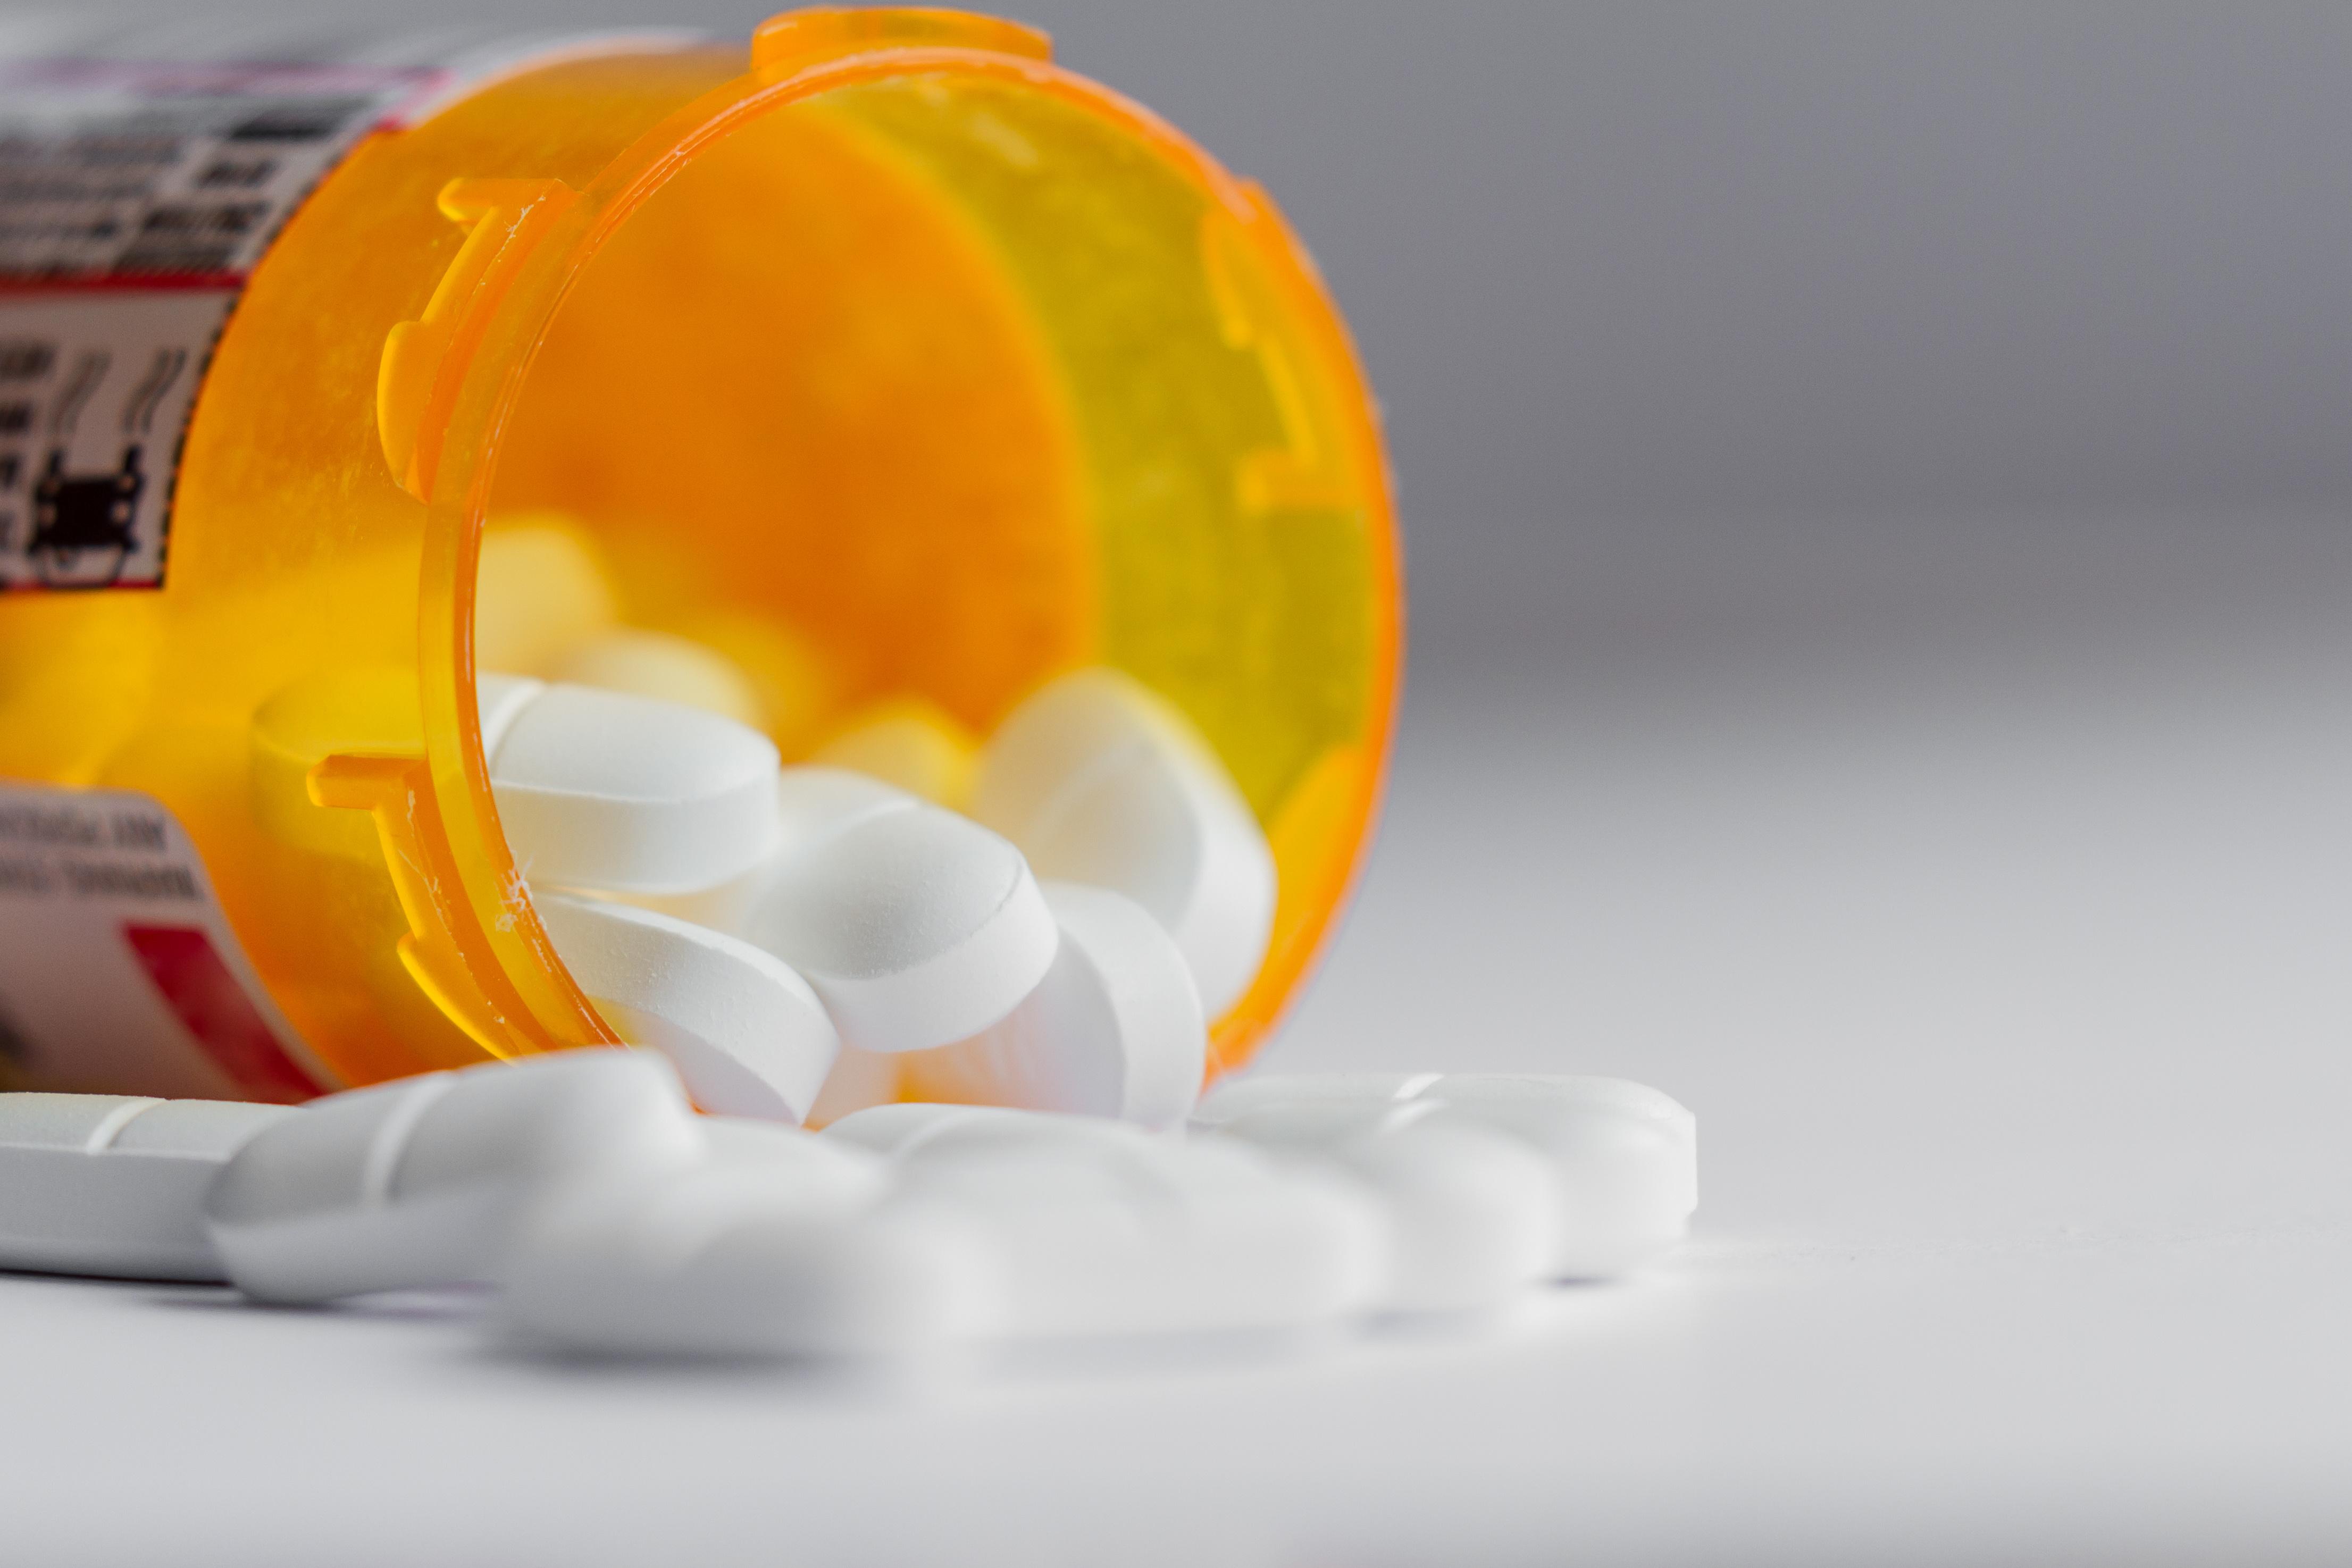 concept for prescription pills